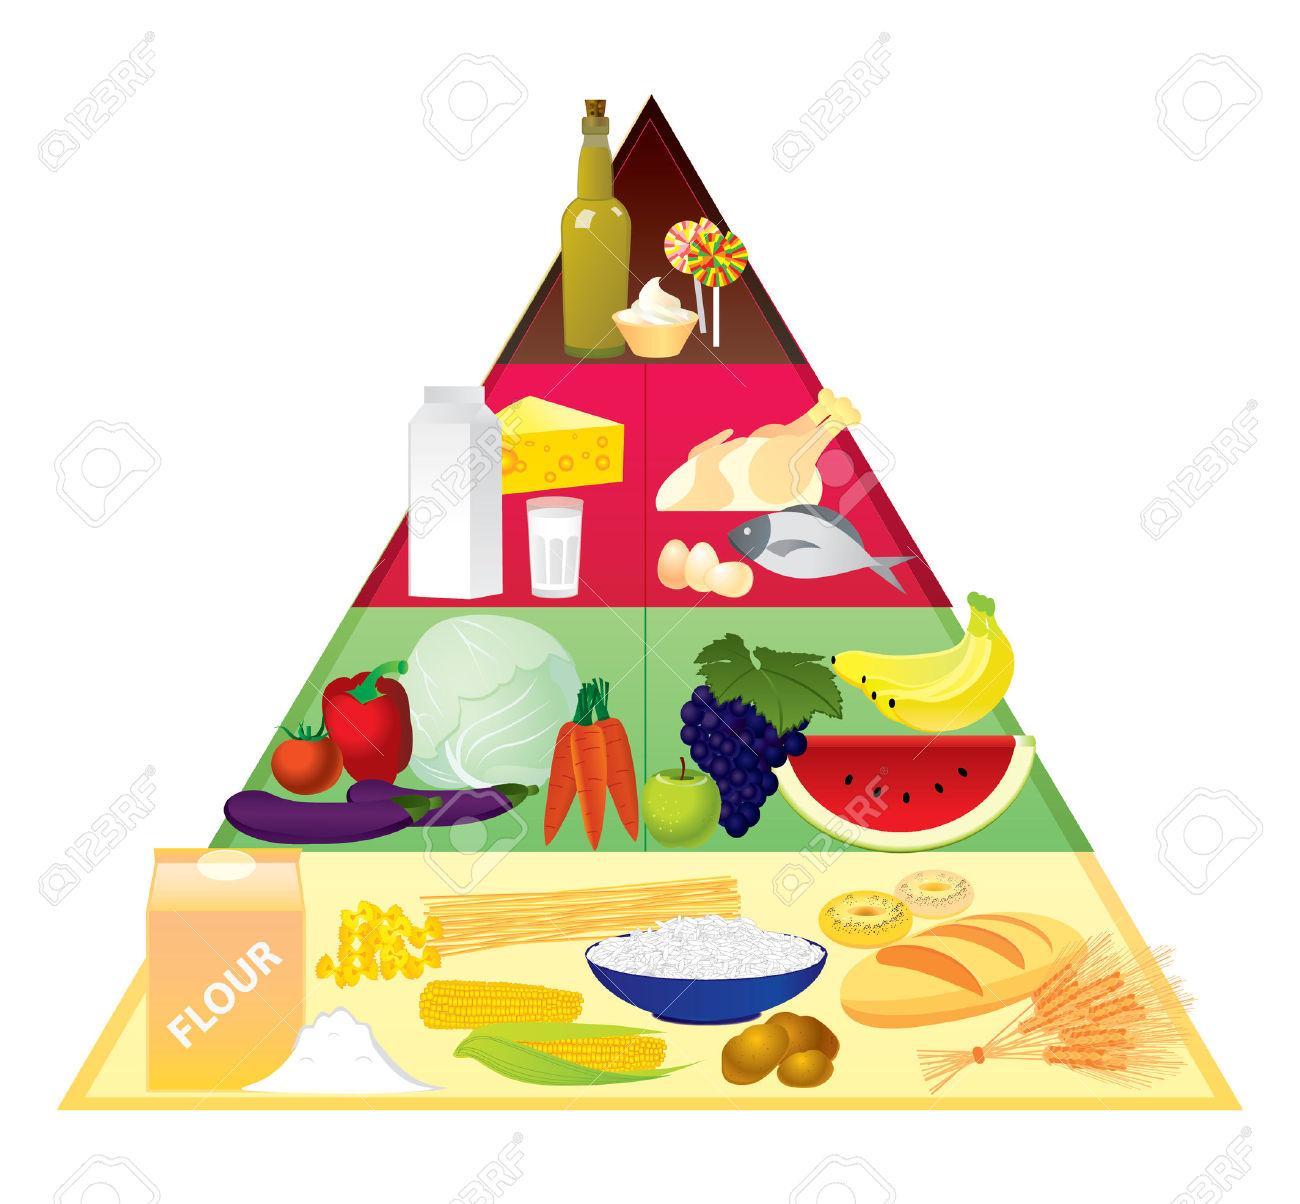 Food pyramid Stock Vector - .-Food pyramid Stock Vector - .-7